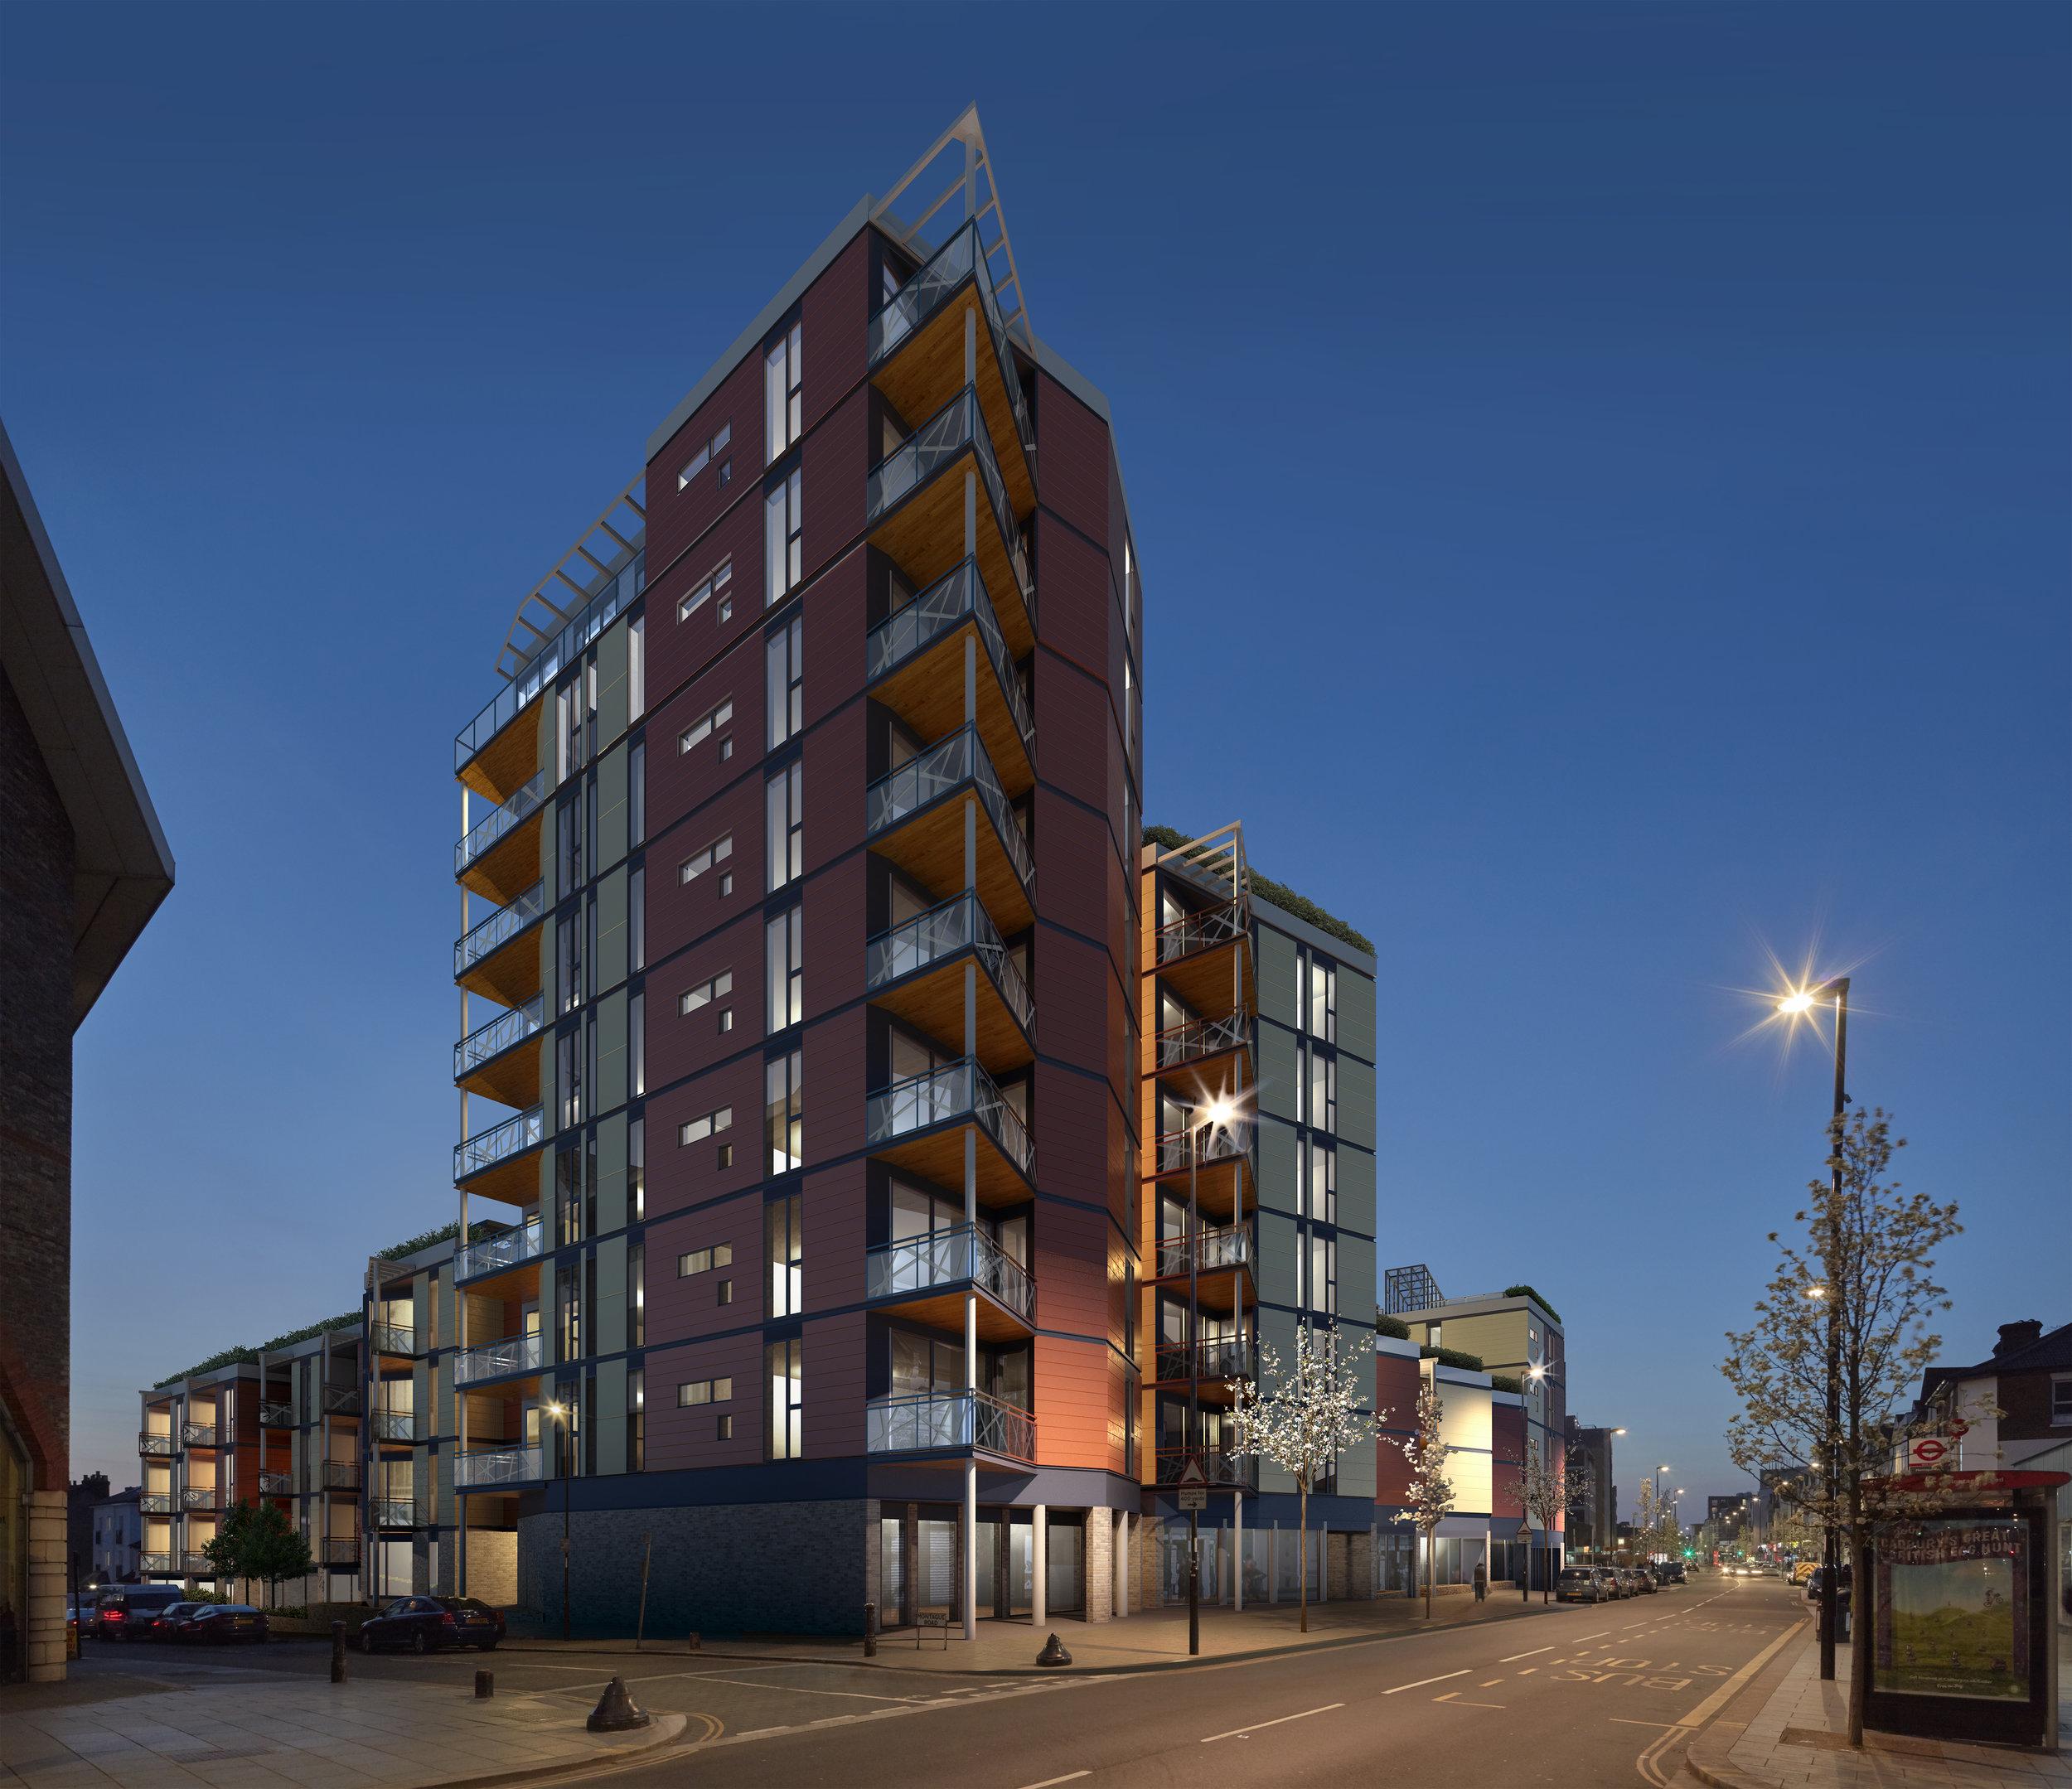 london road croydon -